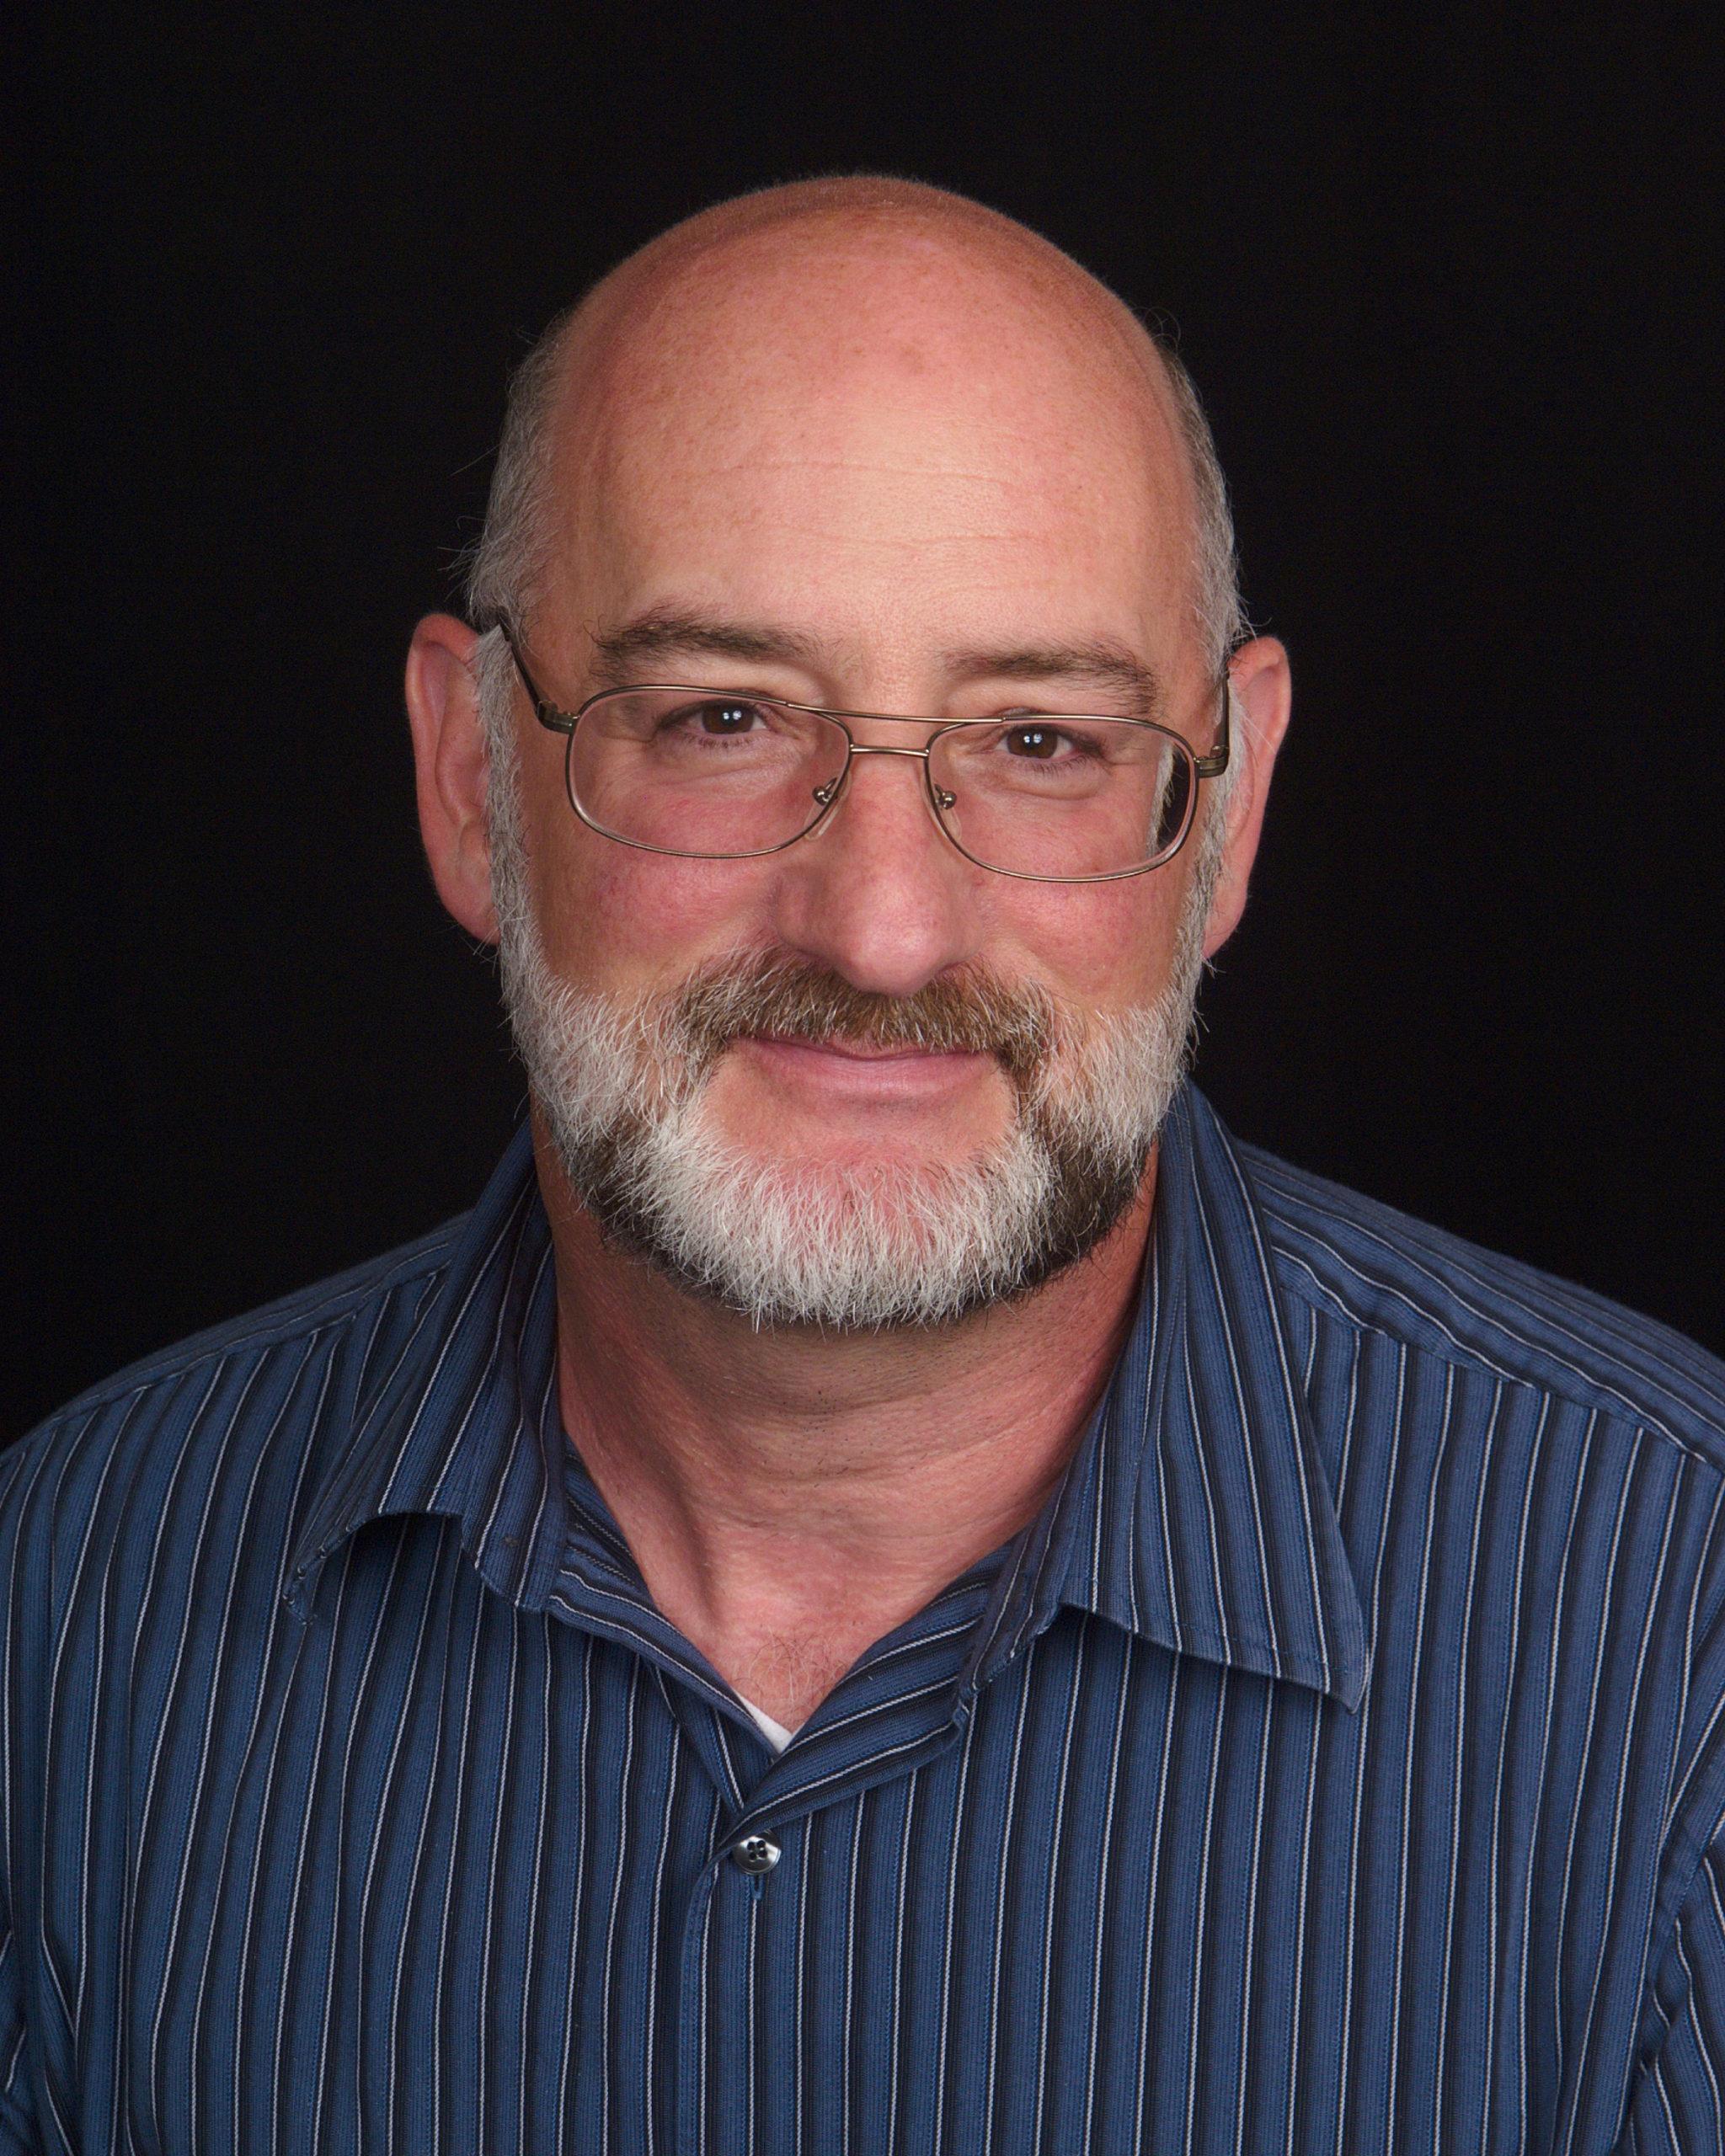 Michael K. Levine